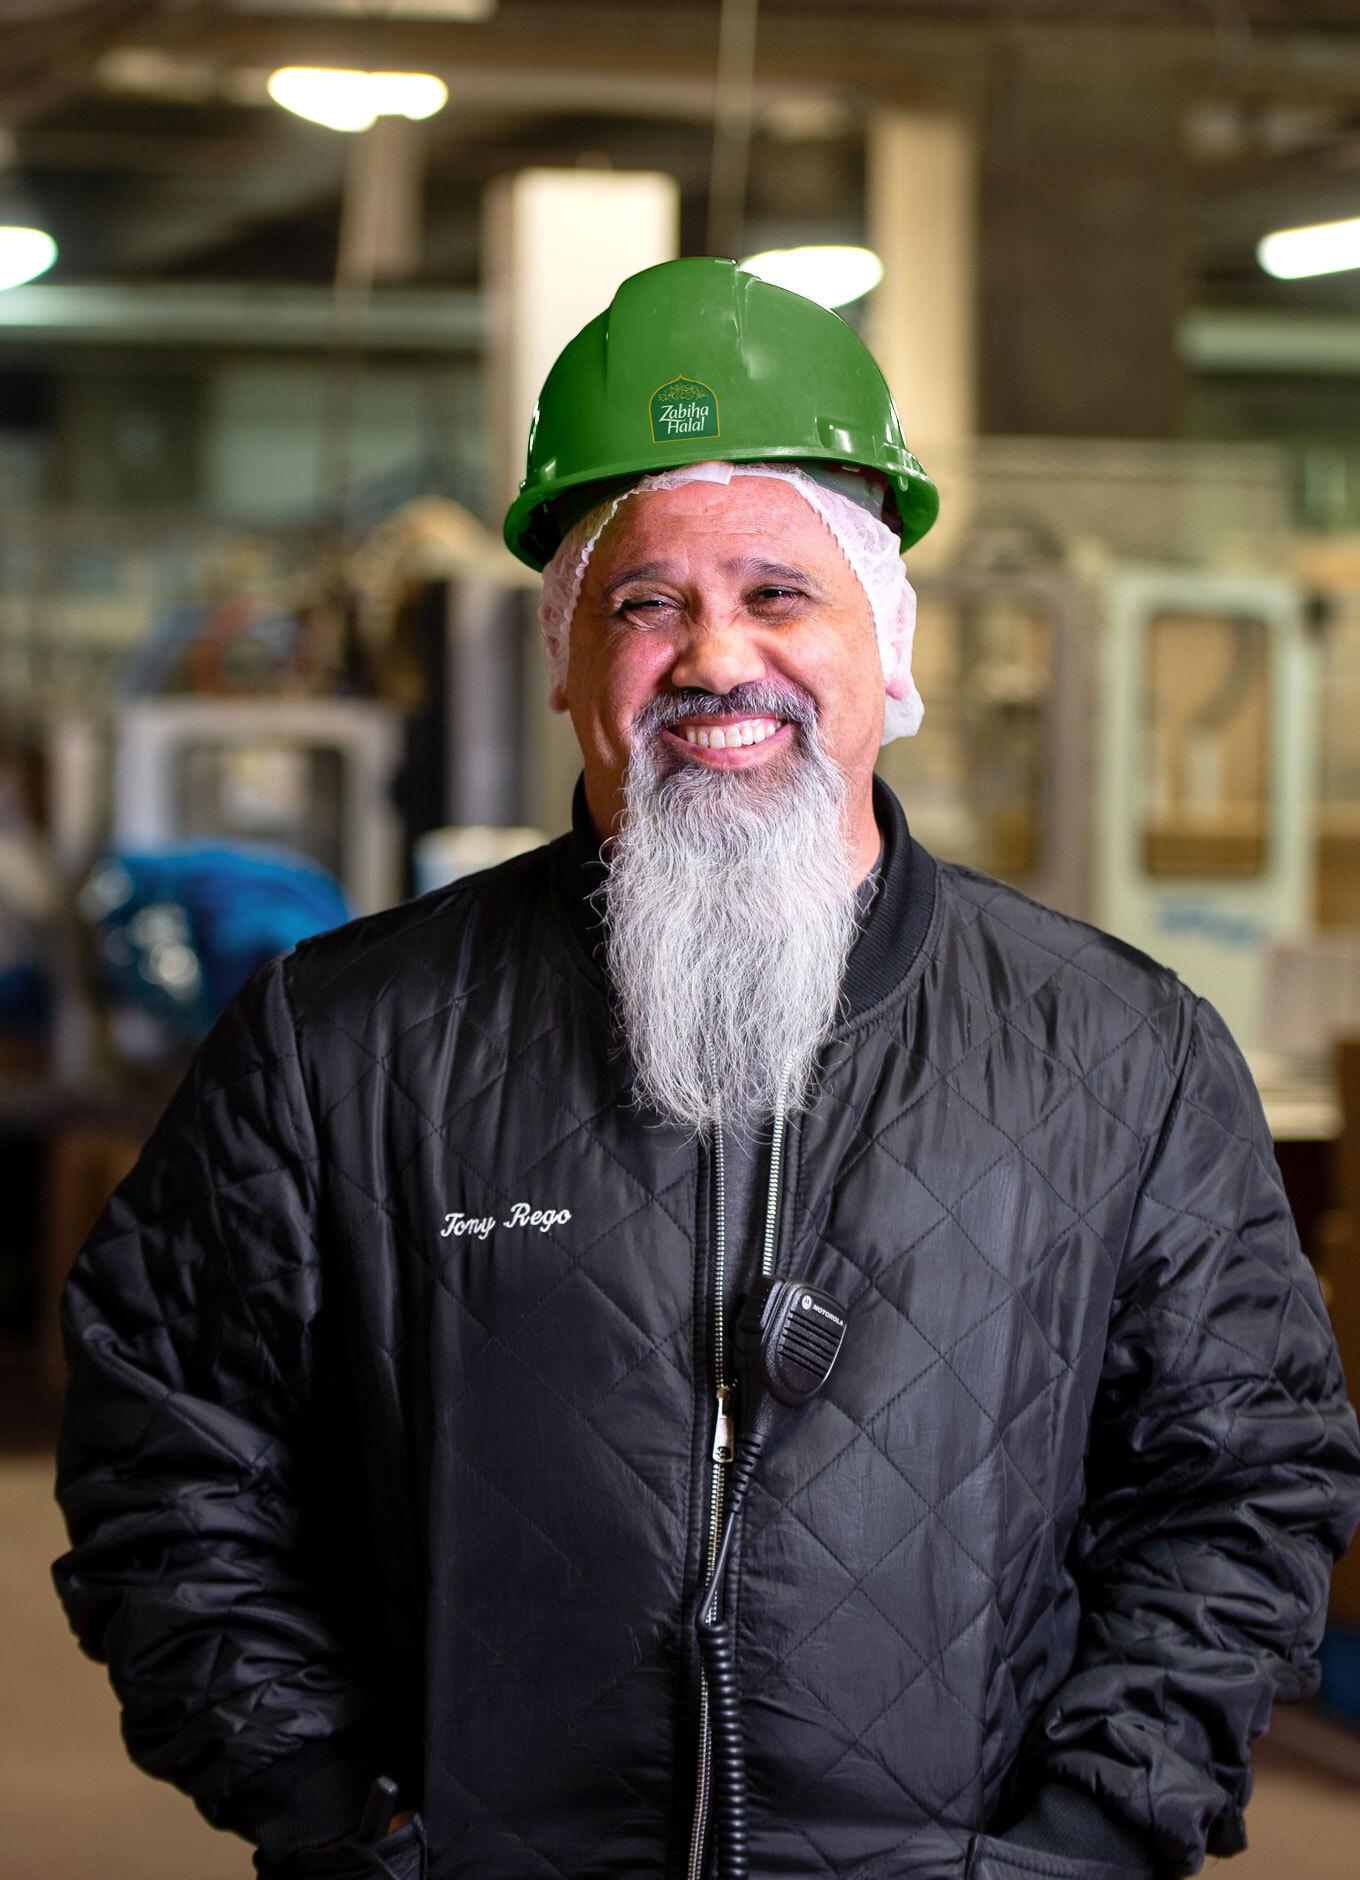 An employee at work making Zabiha Halal food